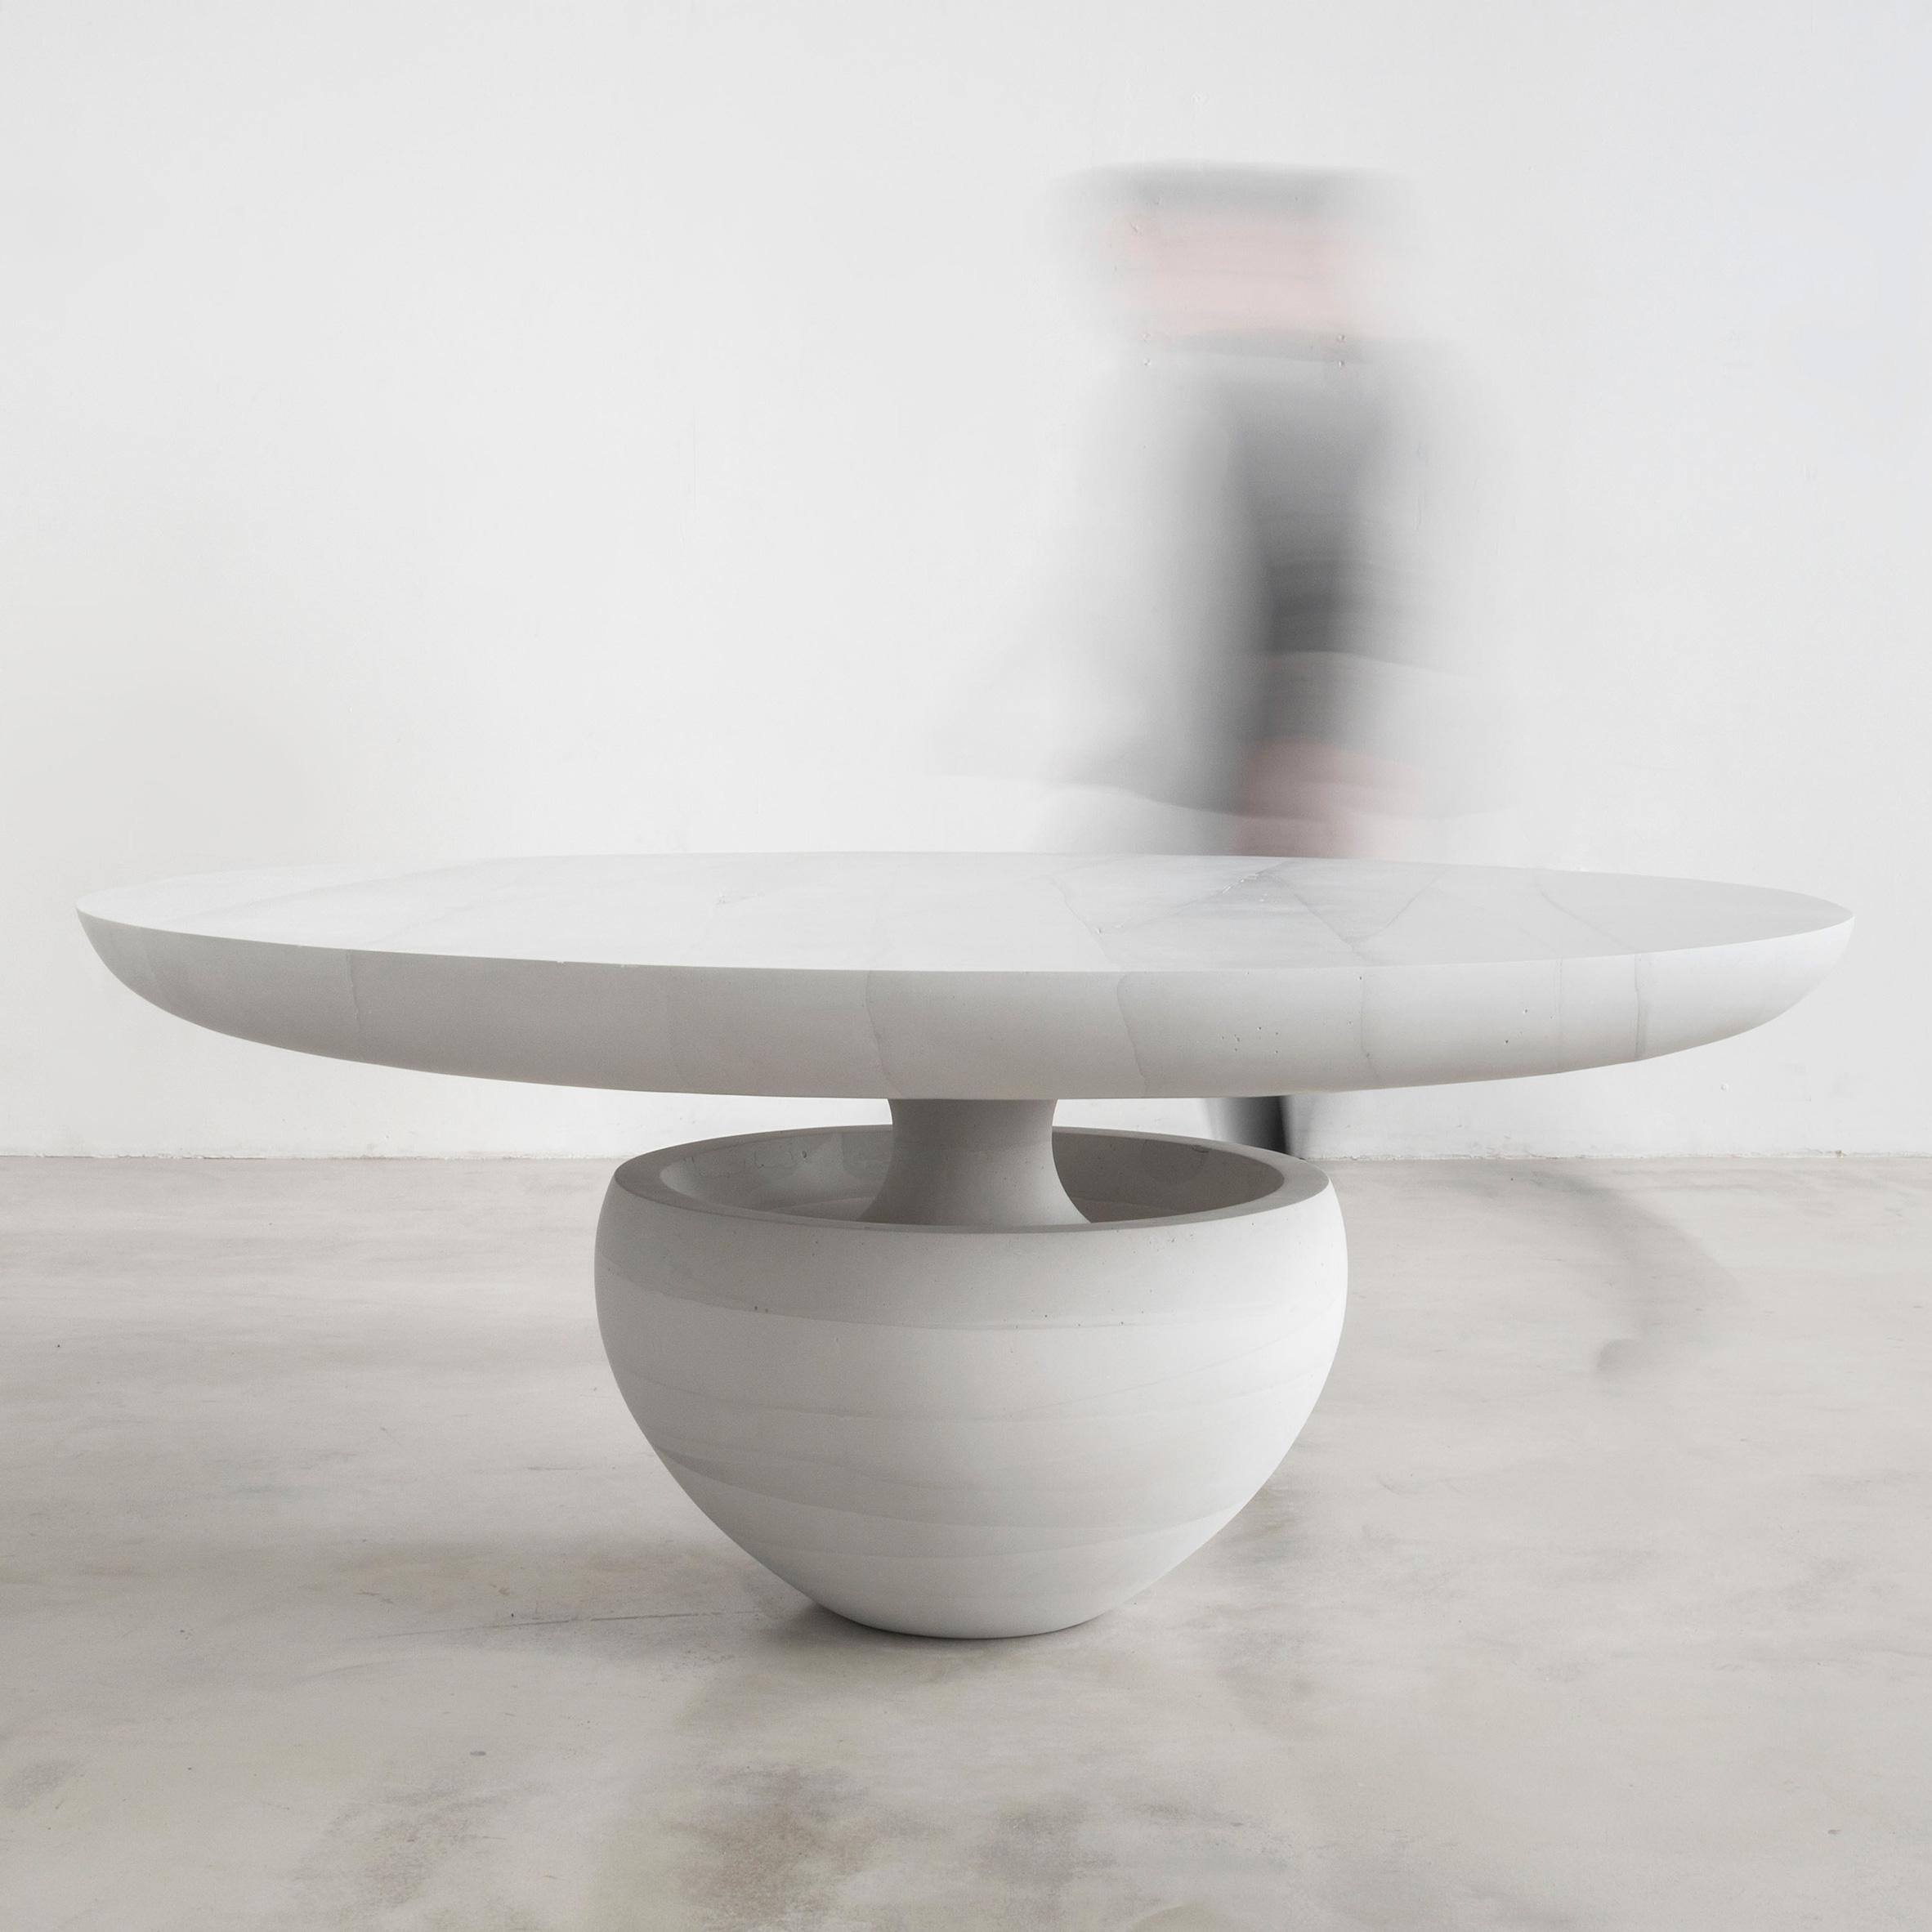 Ghost dining table by Fernando Mastrangelo